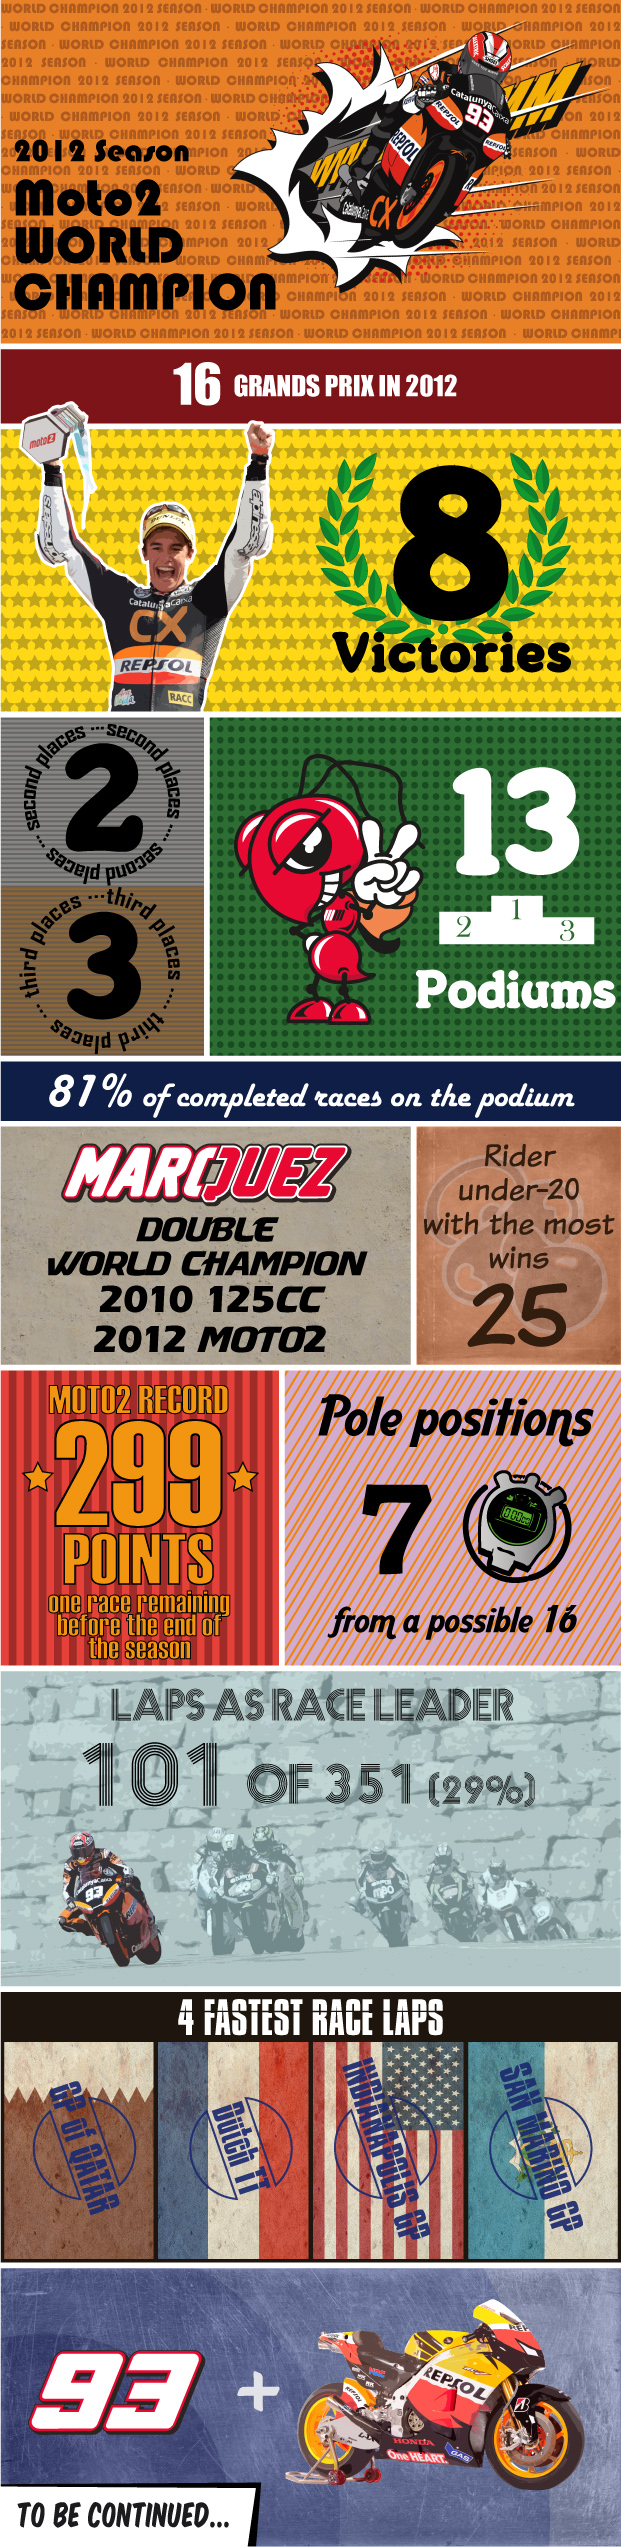 [GP] Phillip Island, 28 octobre 2012 - Page 3 Marquez2012eng